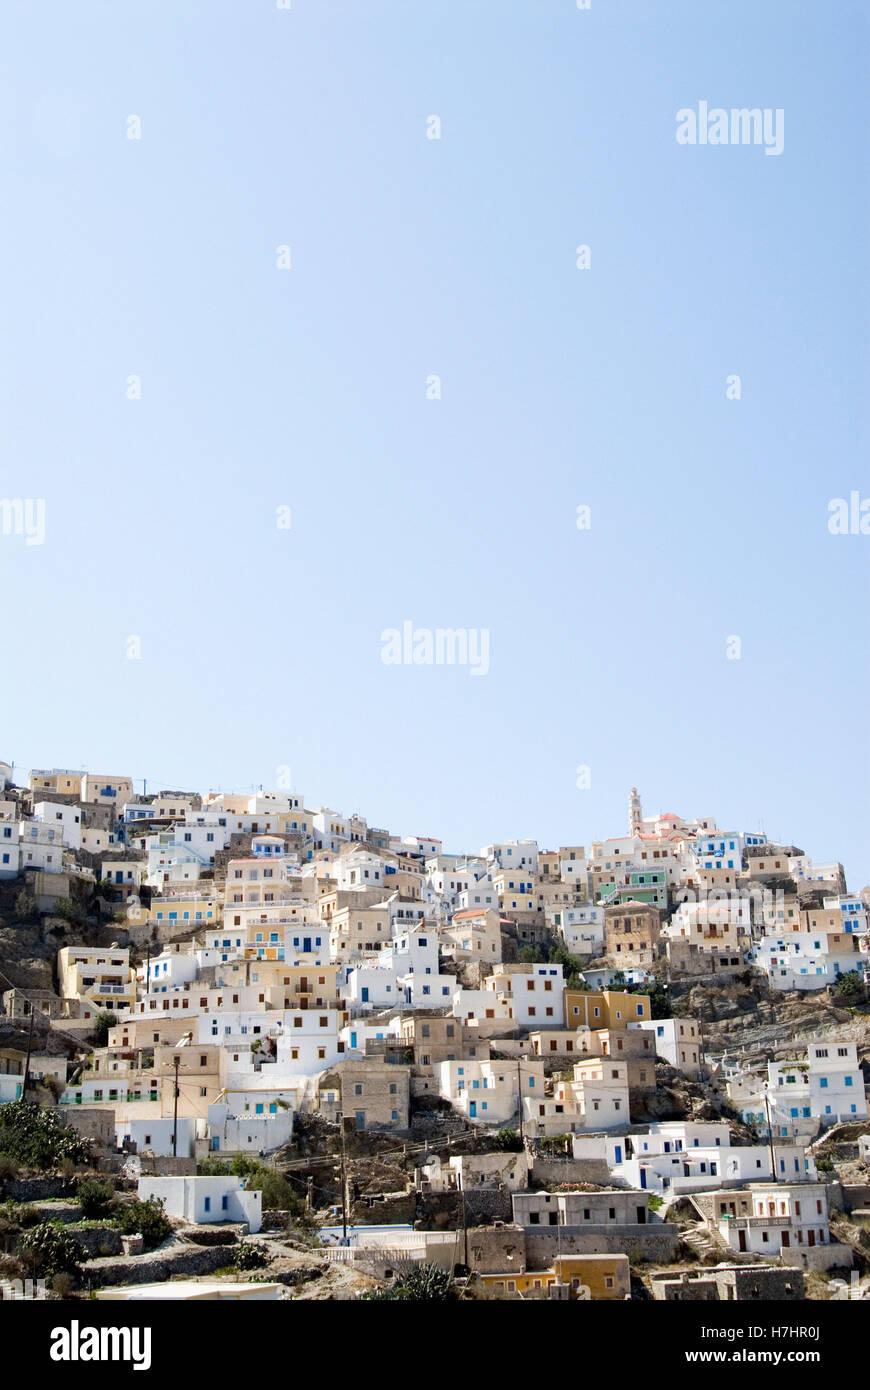 Mountain village of Olympos on the Greek island of Karpathos, Greece, Europe Stock Photo